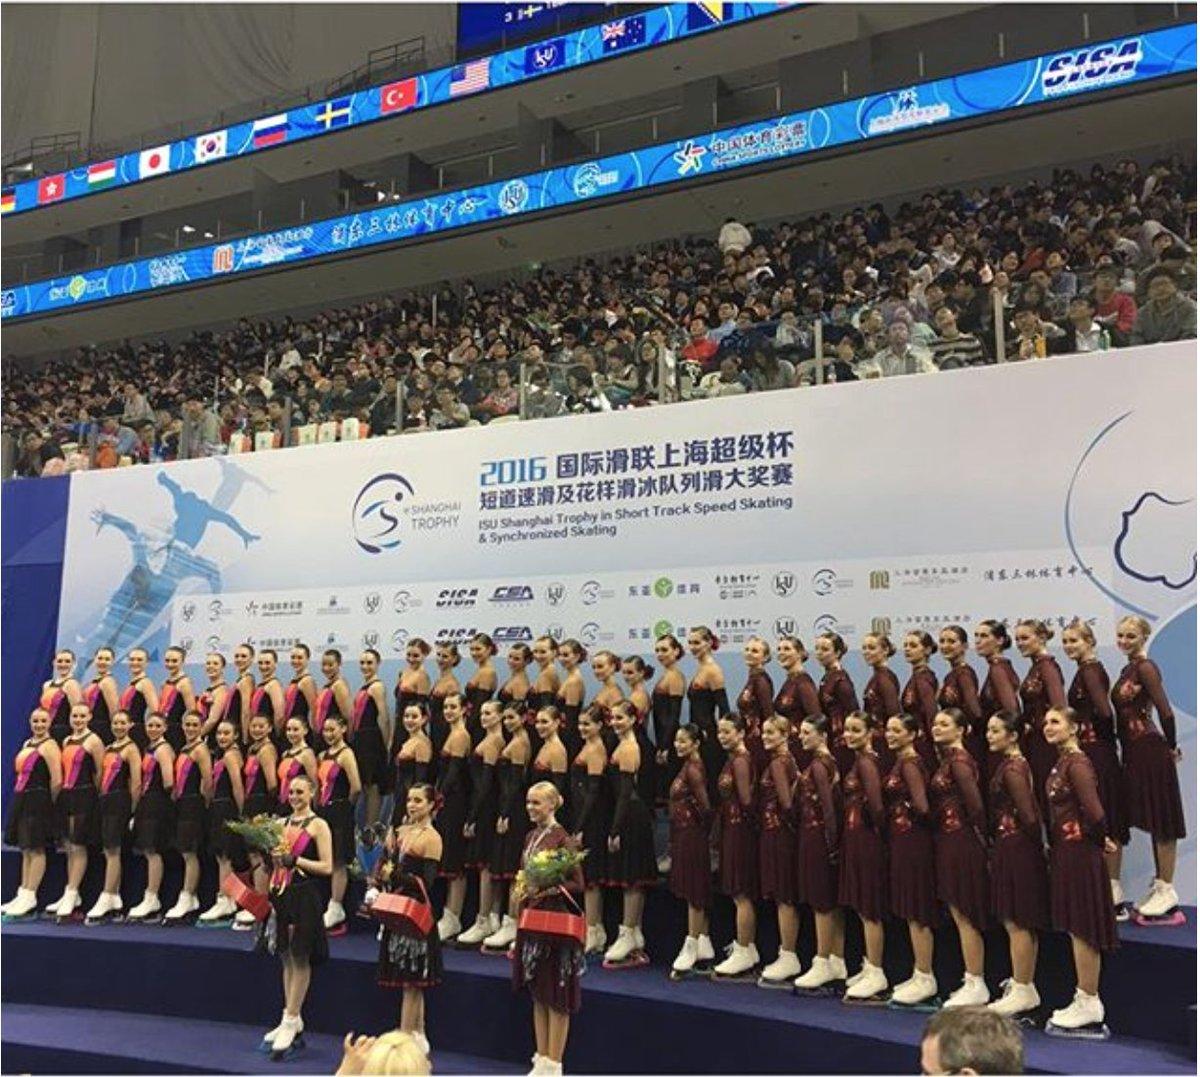 Соревнования сезона 2015 - 2016 (общая) - 2 - Страница 8 Cc9GQ5IUIAAx_aq